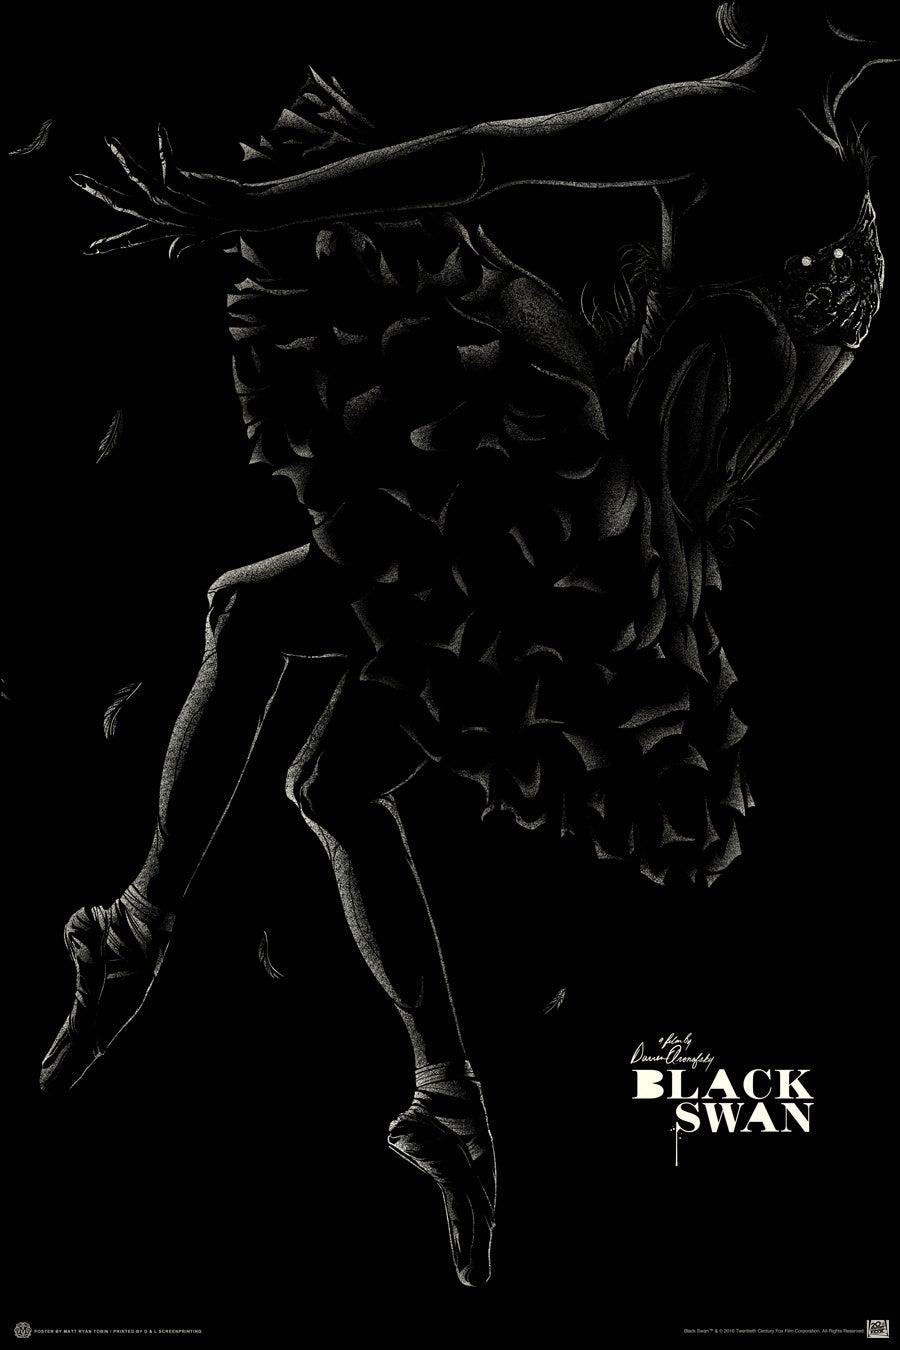 MONDO BLACK SWAN - Variant